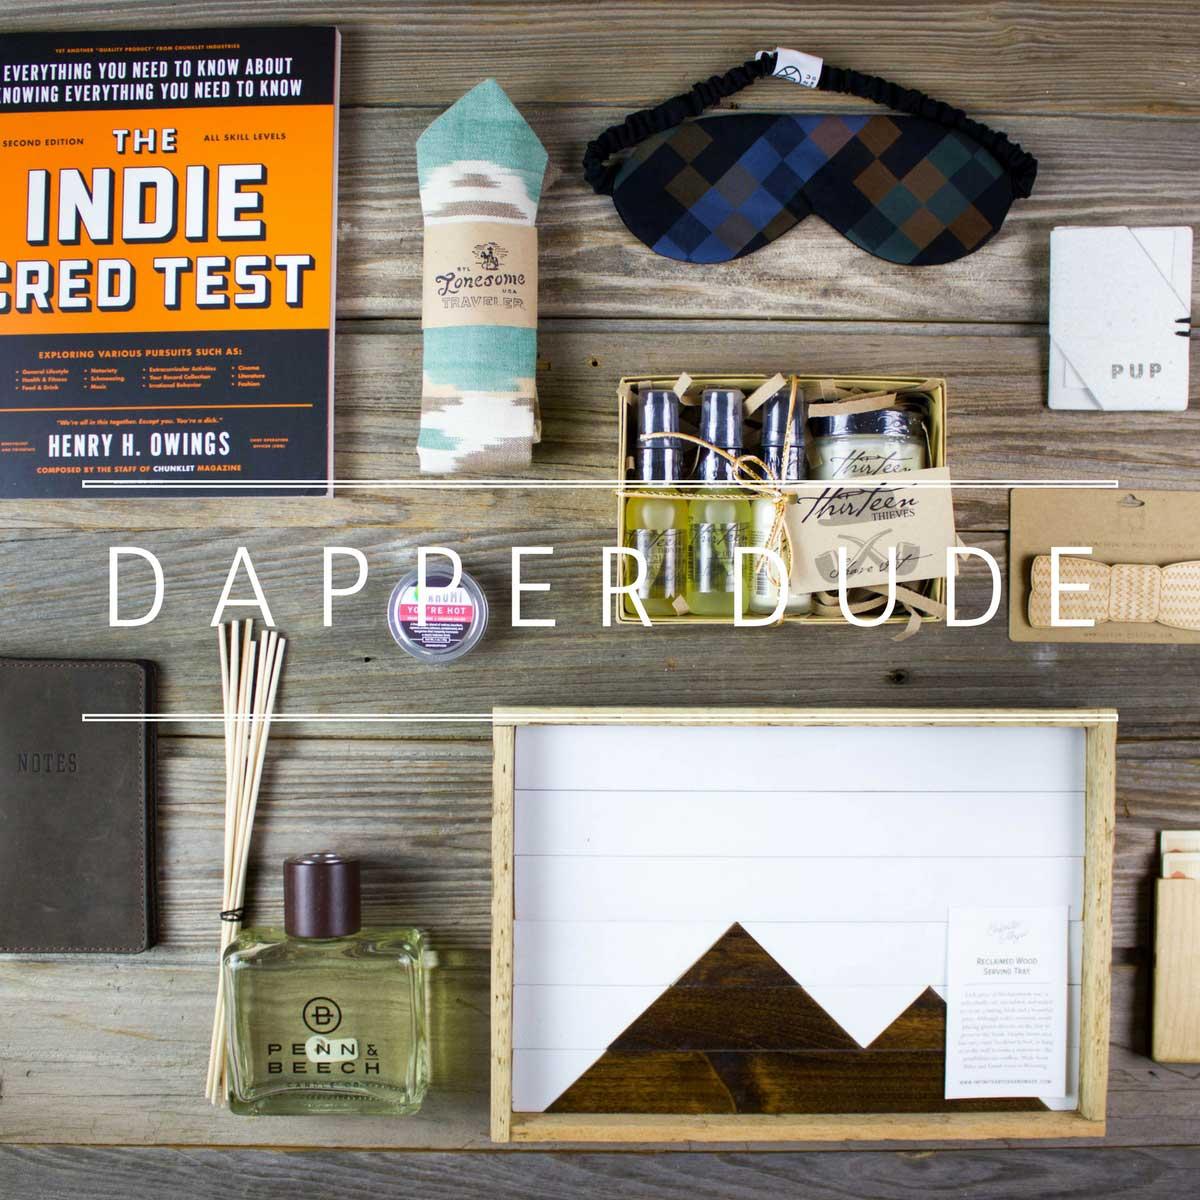 dapper, dude, man gifts, men, handmade, indie